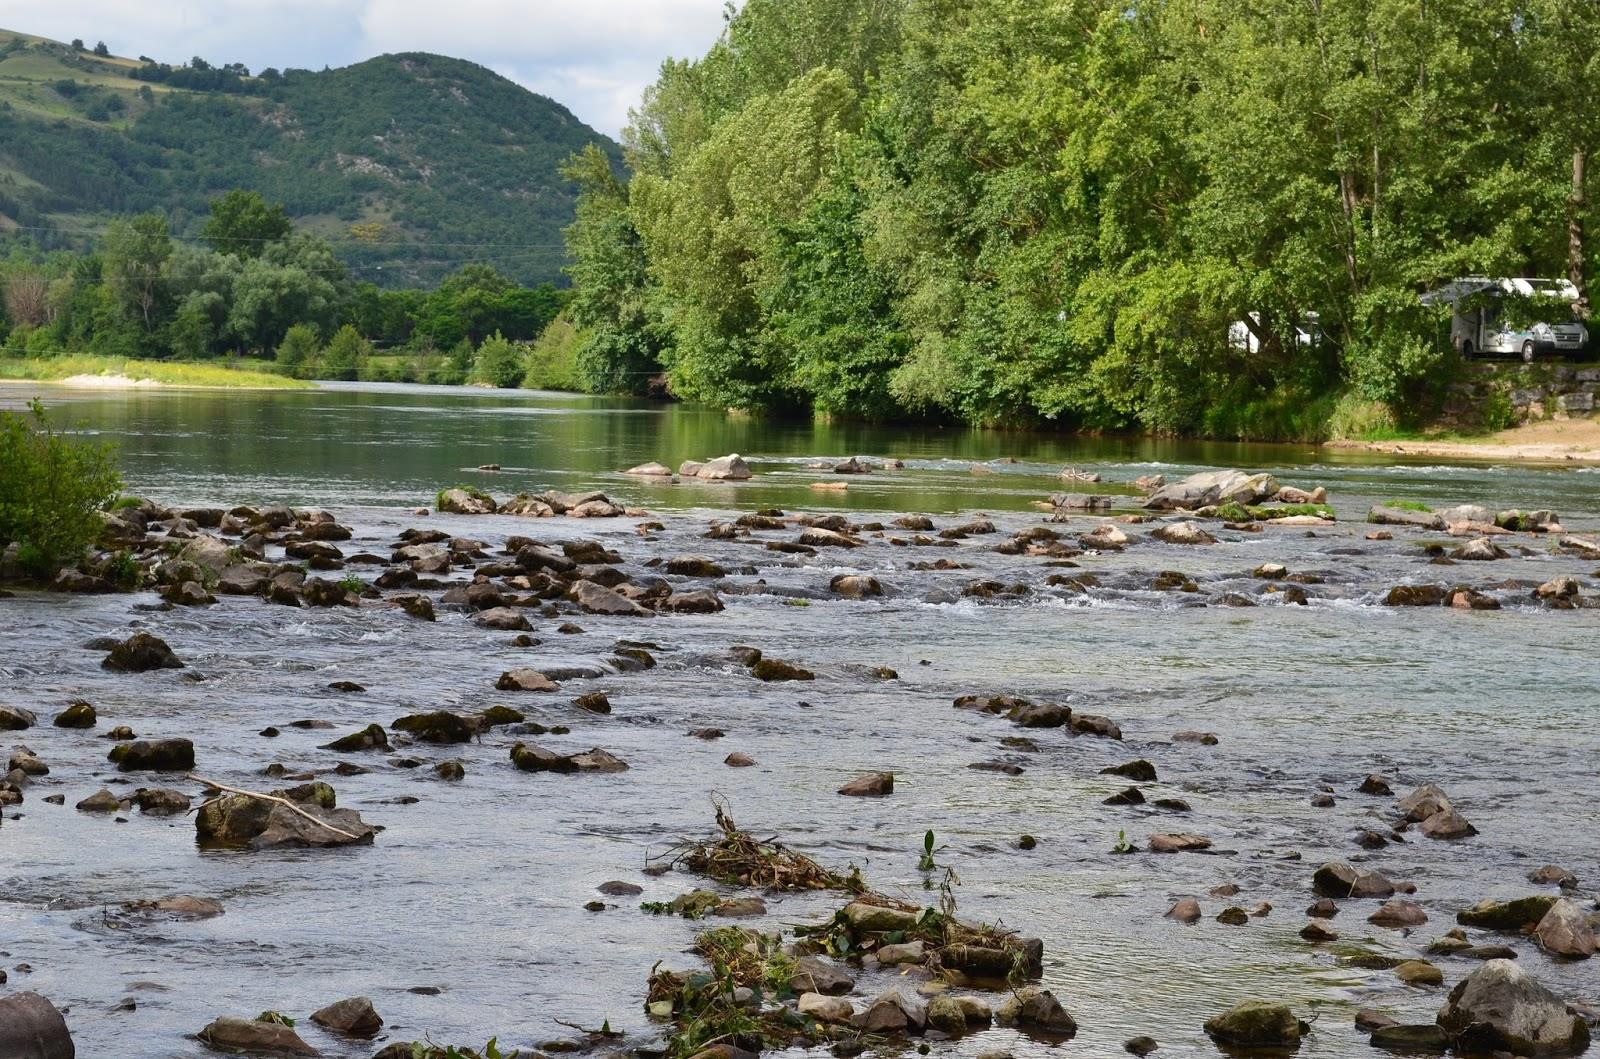 Ma tribu de jumeaux, : Un week-end dans l\' Aveyron au Cun du Larzac ...